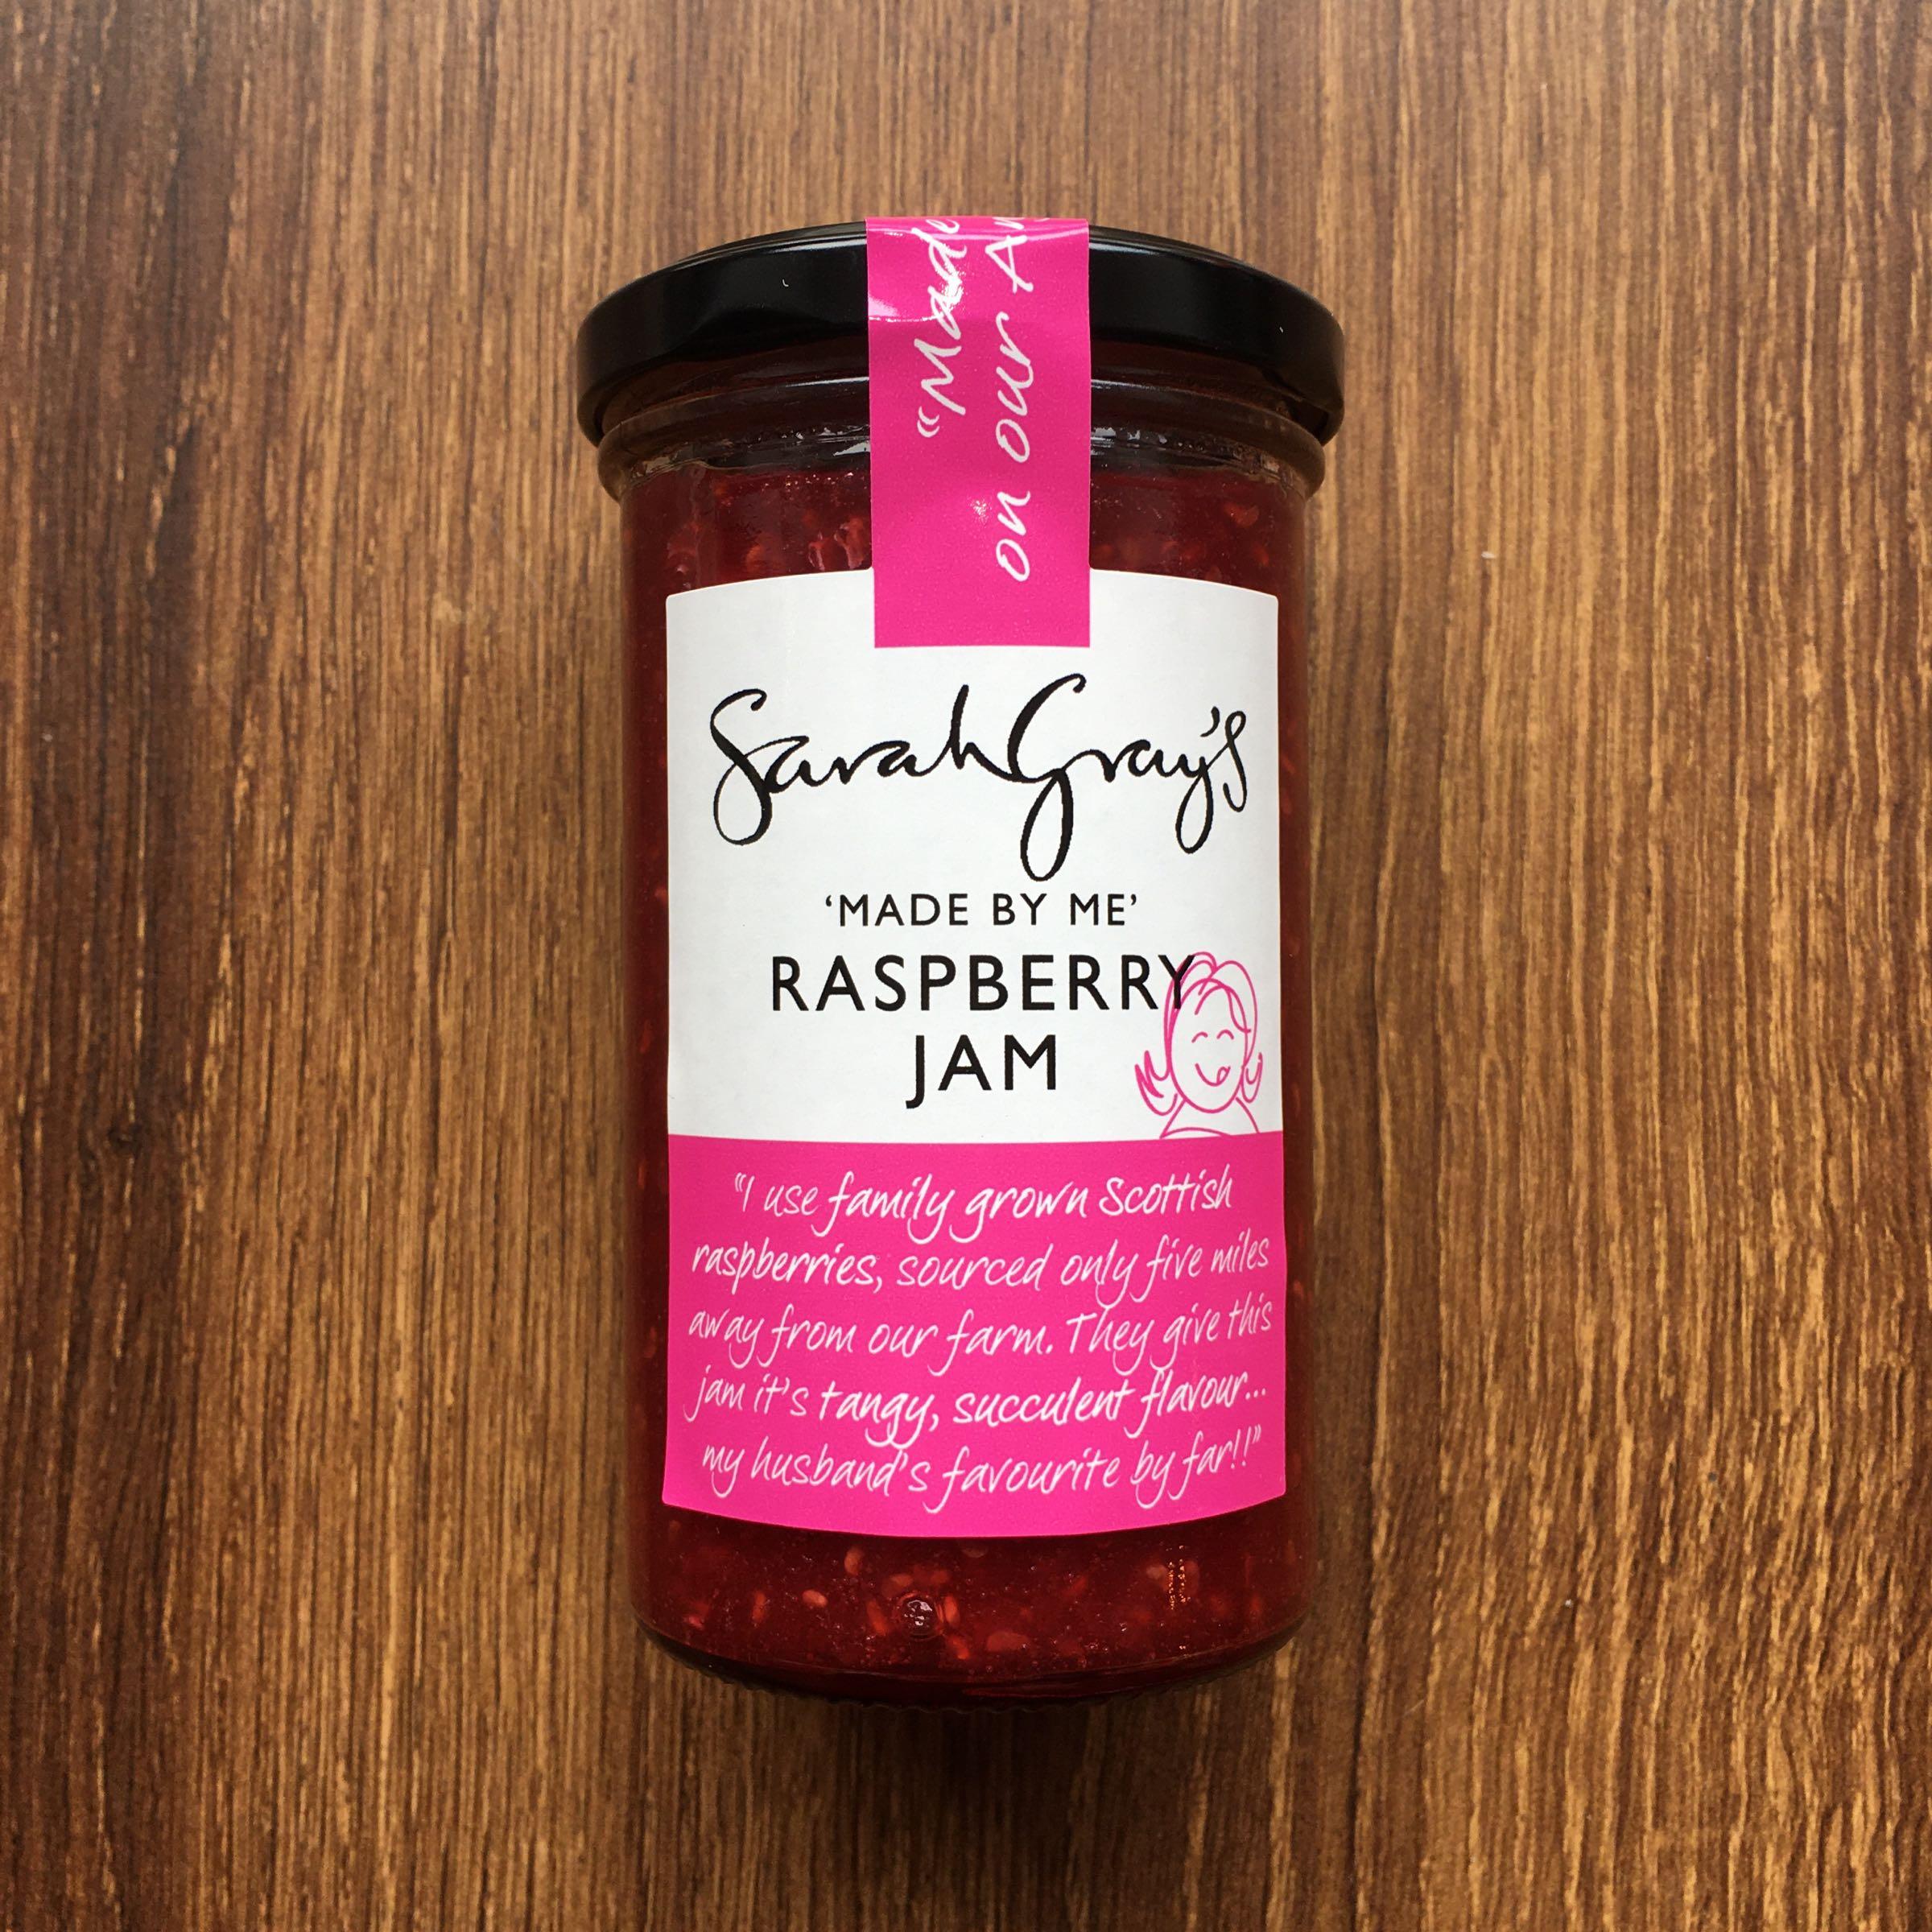 Sarah Gray's Raspberry Jam